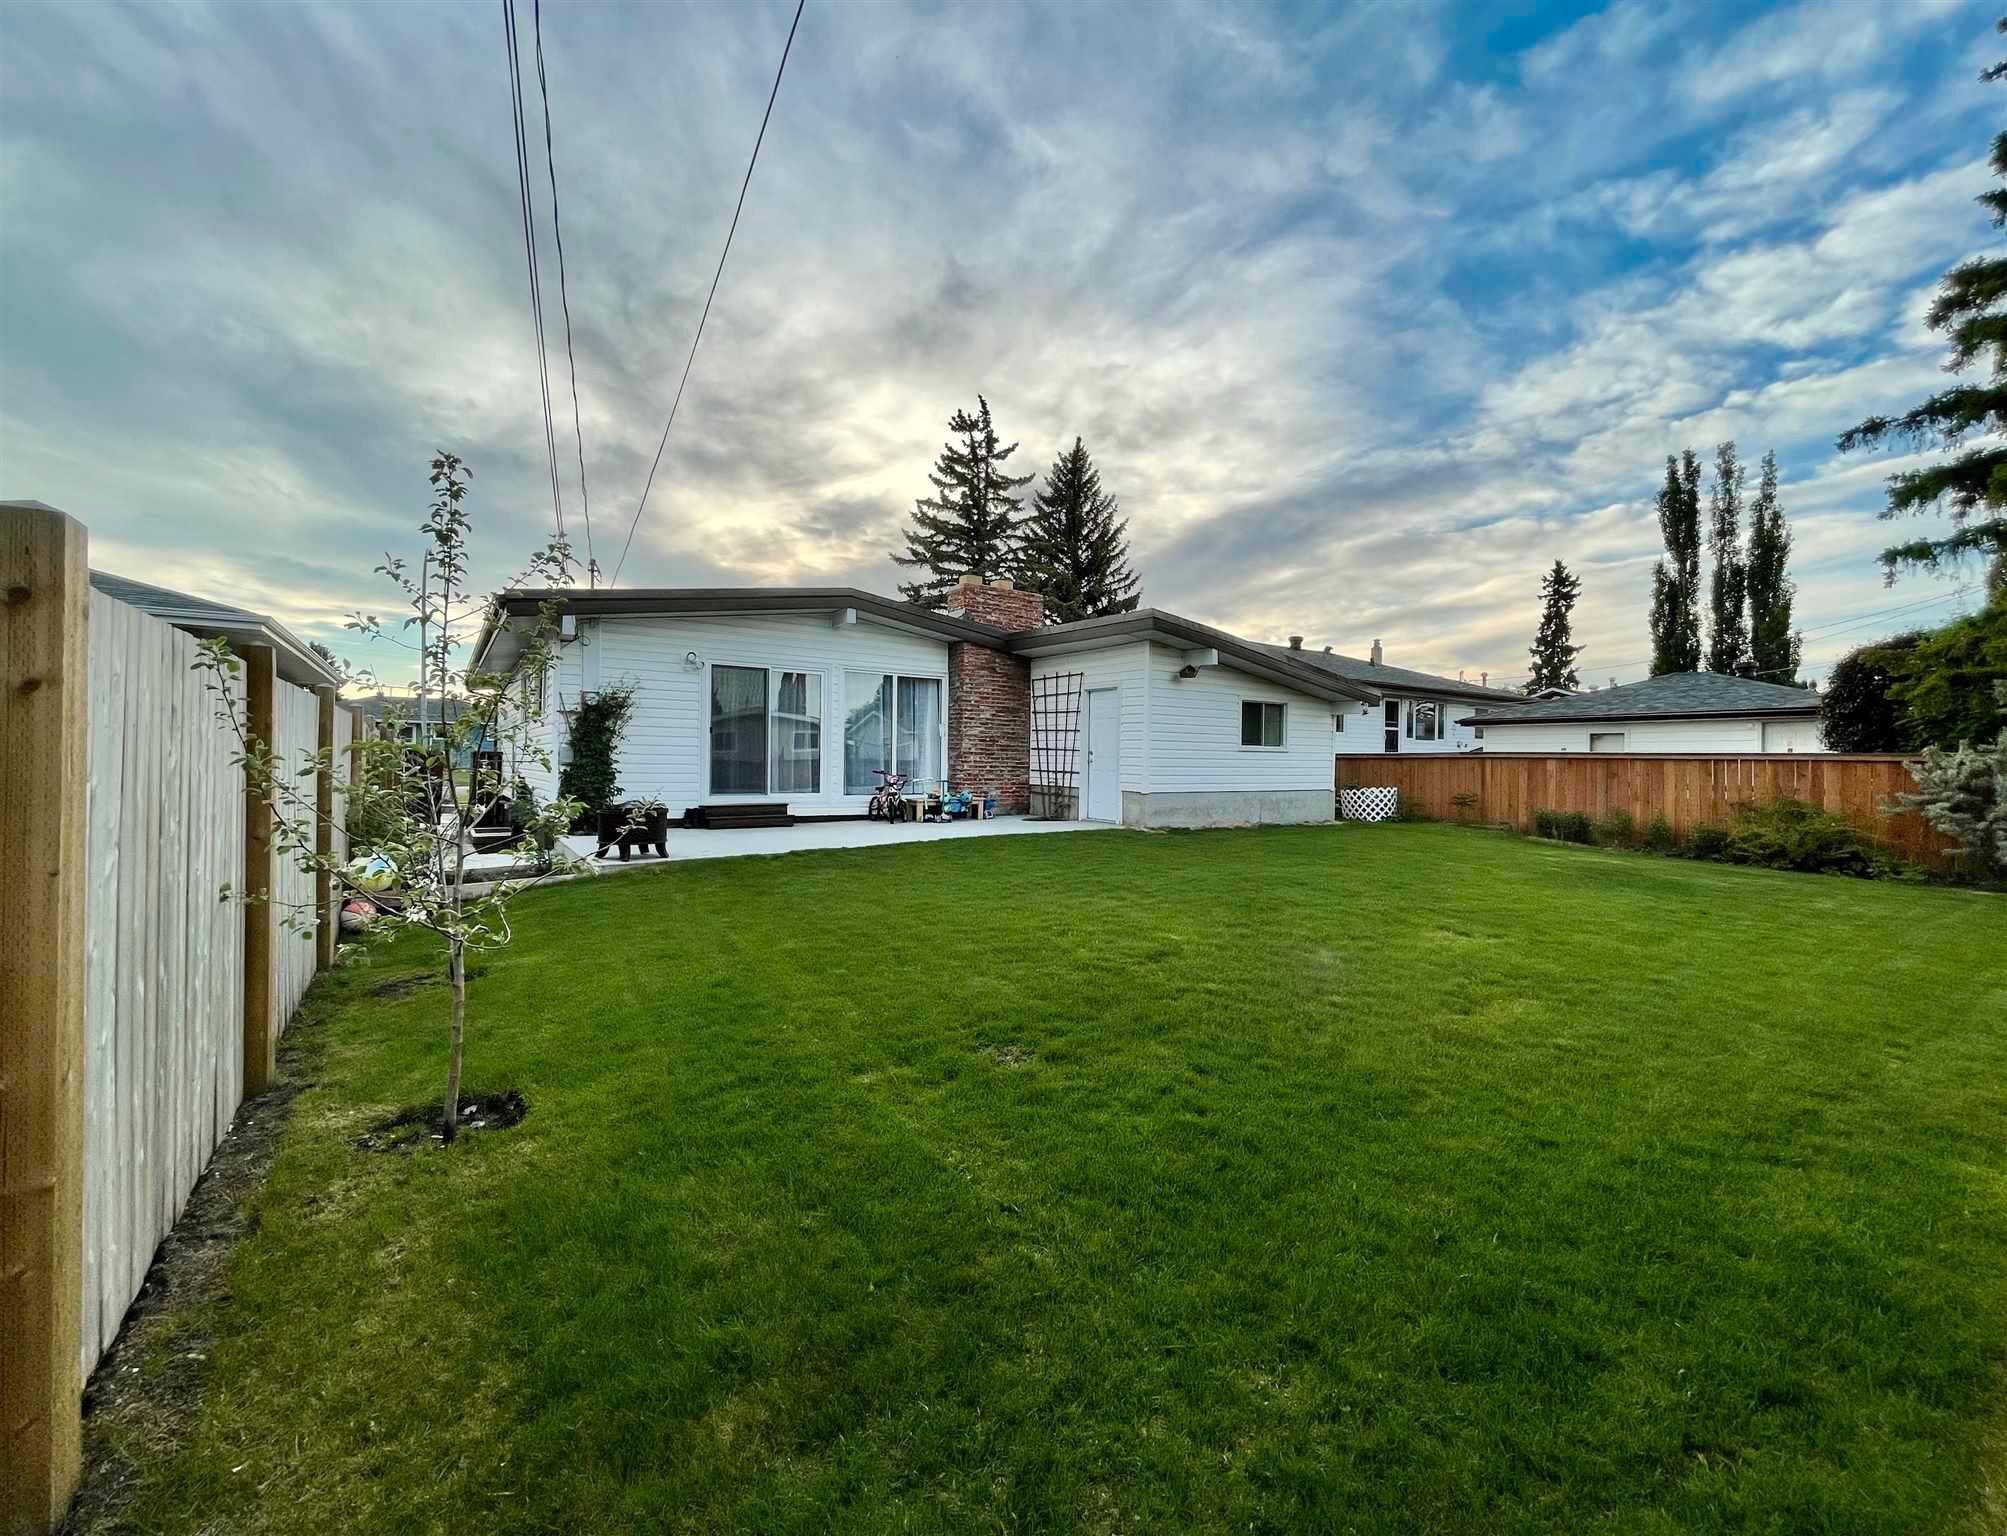 Main Photo: 8907 162 Street in Edmonton: Zone 22 House for sale : MLS®# E4243515